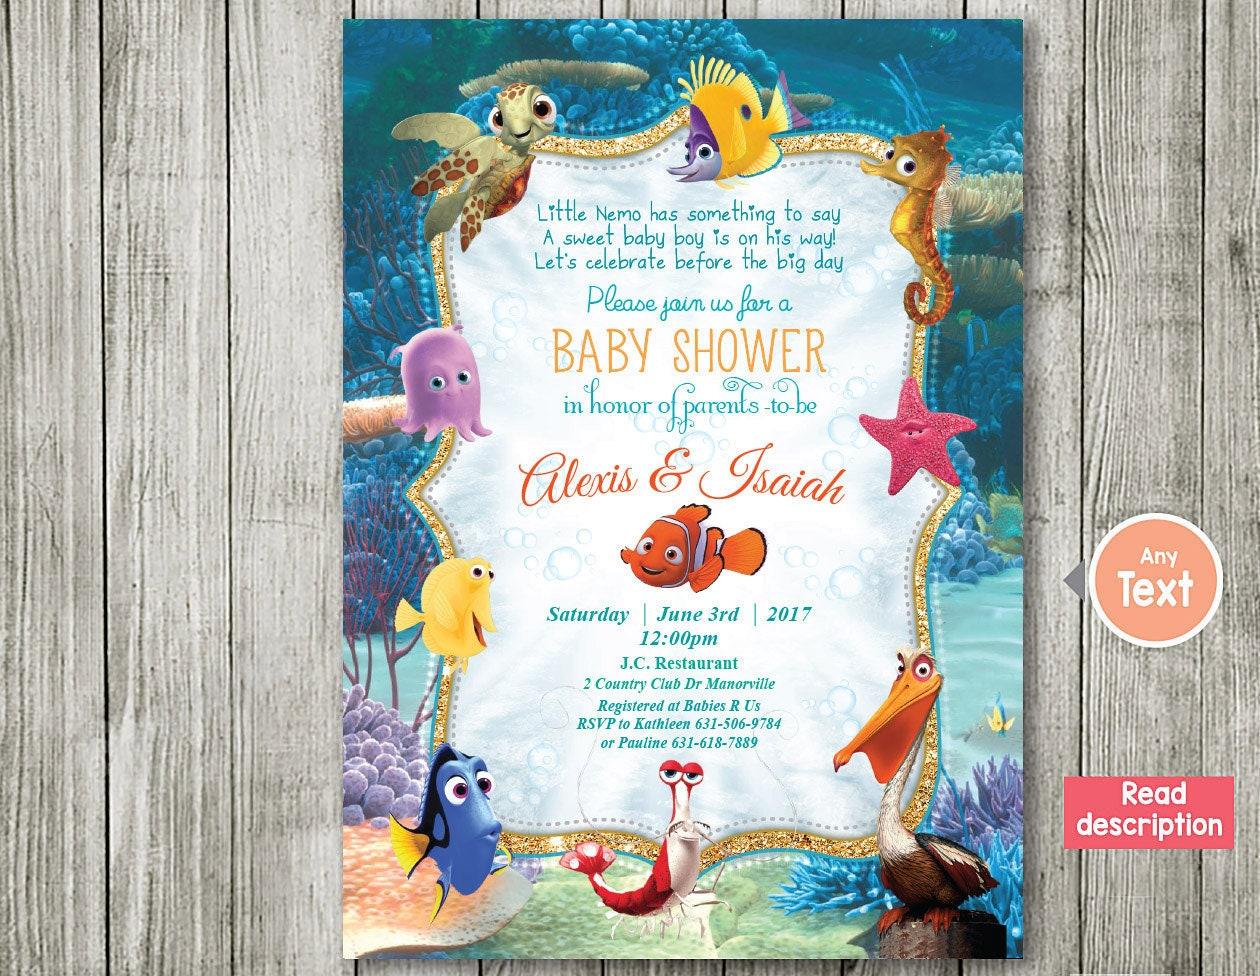 Finding nemo invitation Baby shower invitation nemo baby